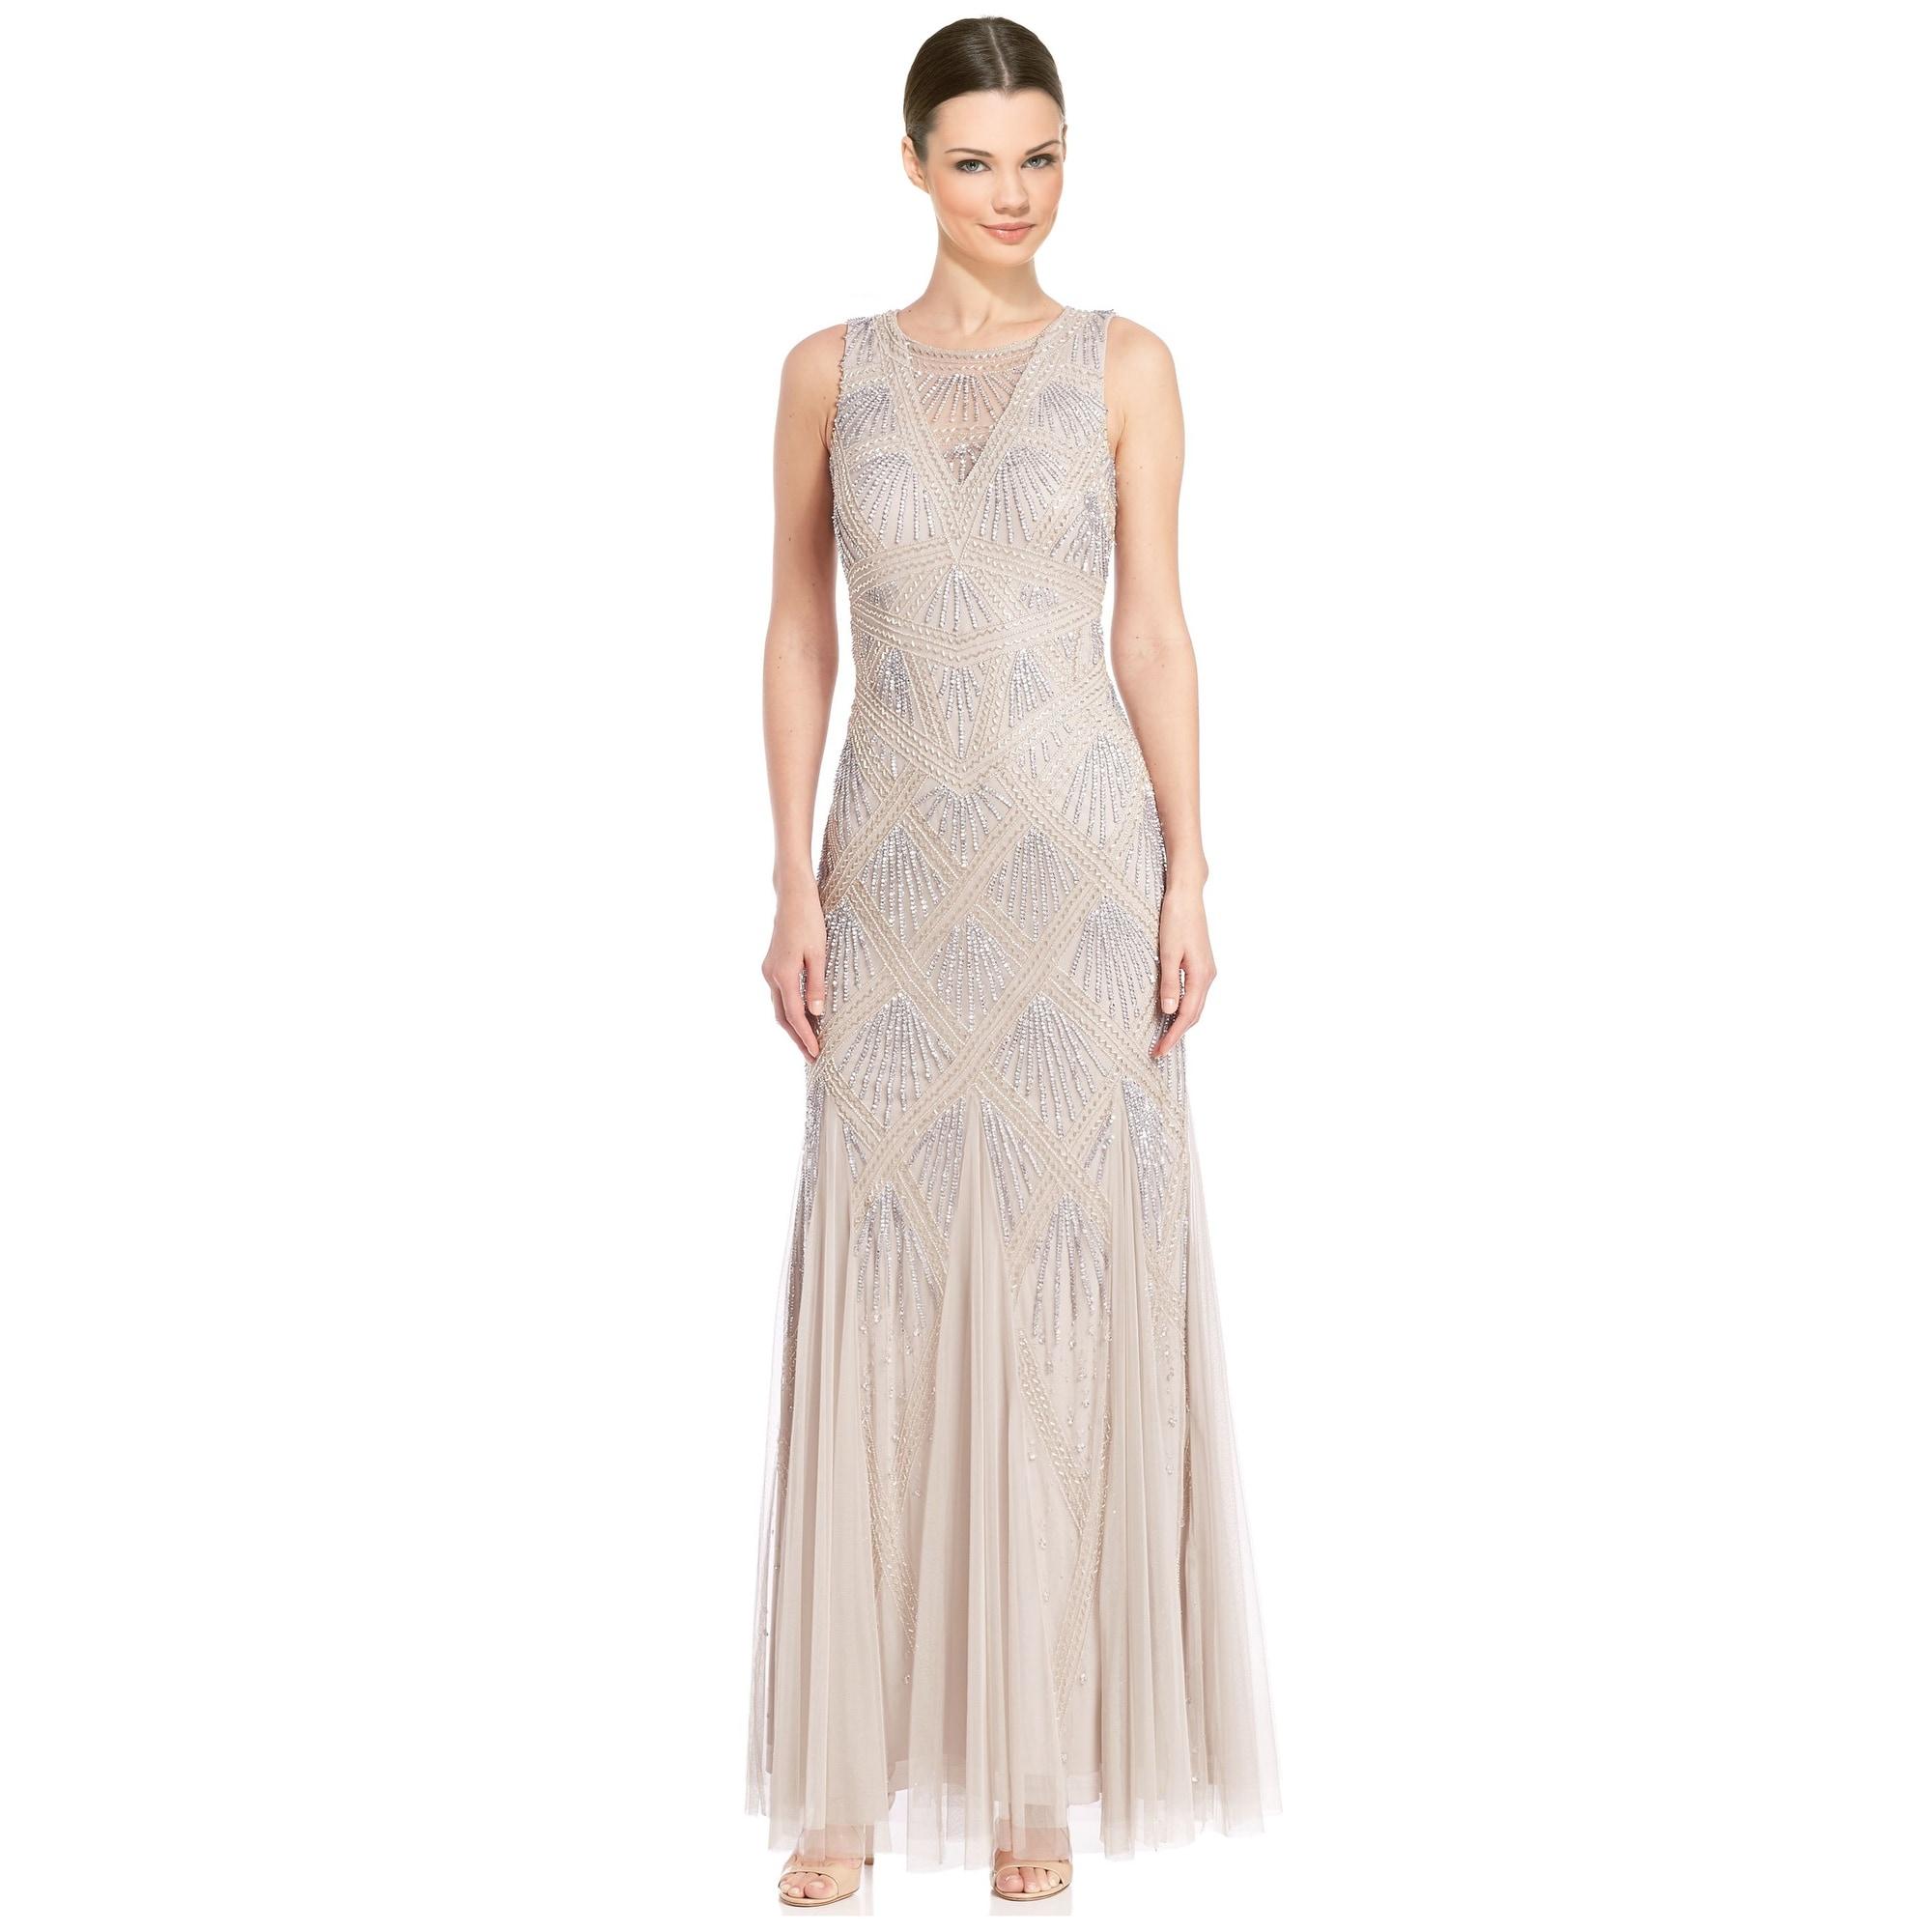 Aidan Mattox Beaded Godet Evening Gown Dress - Free Shipping Today ...